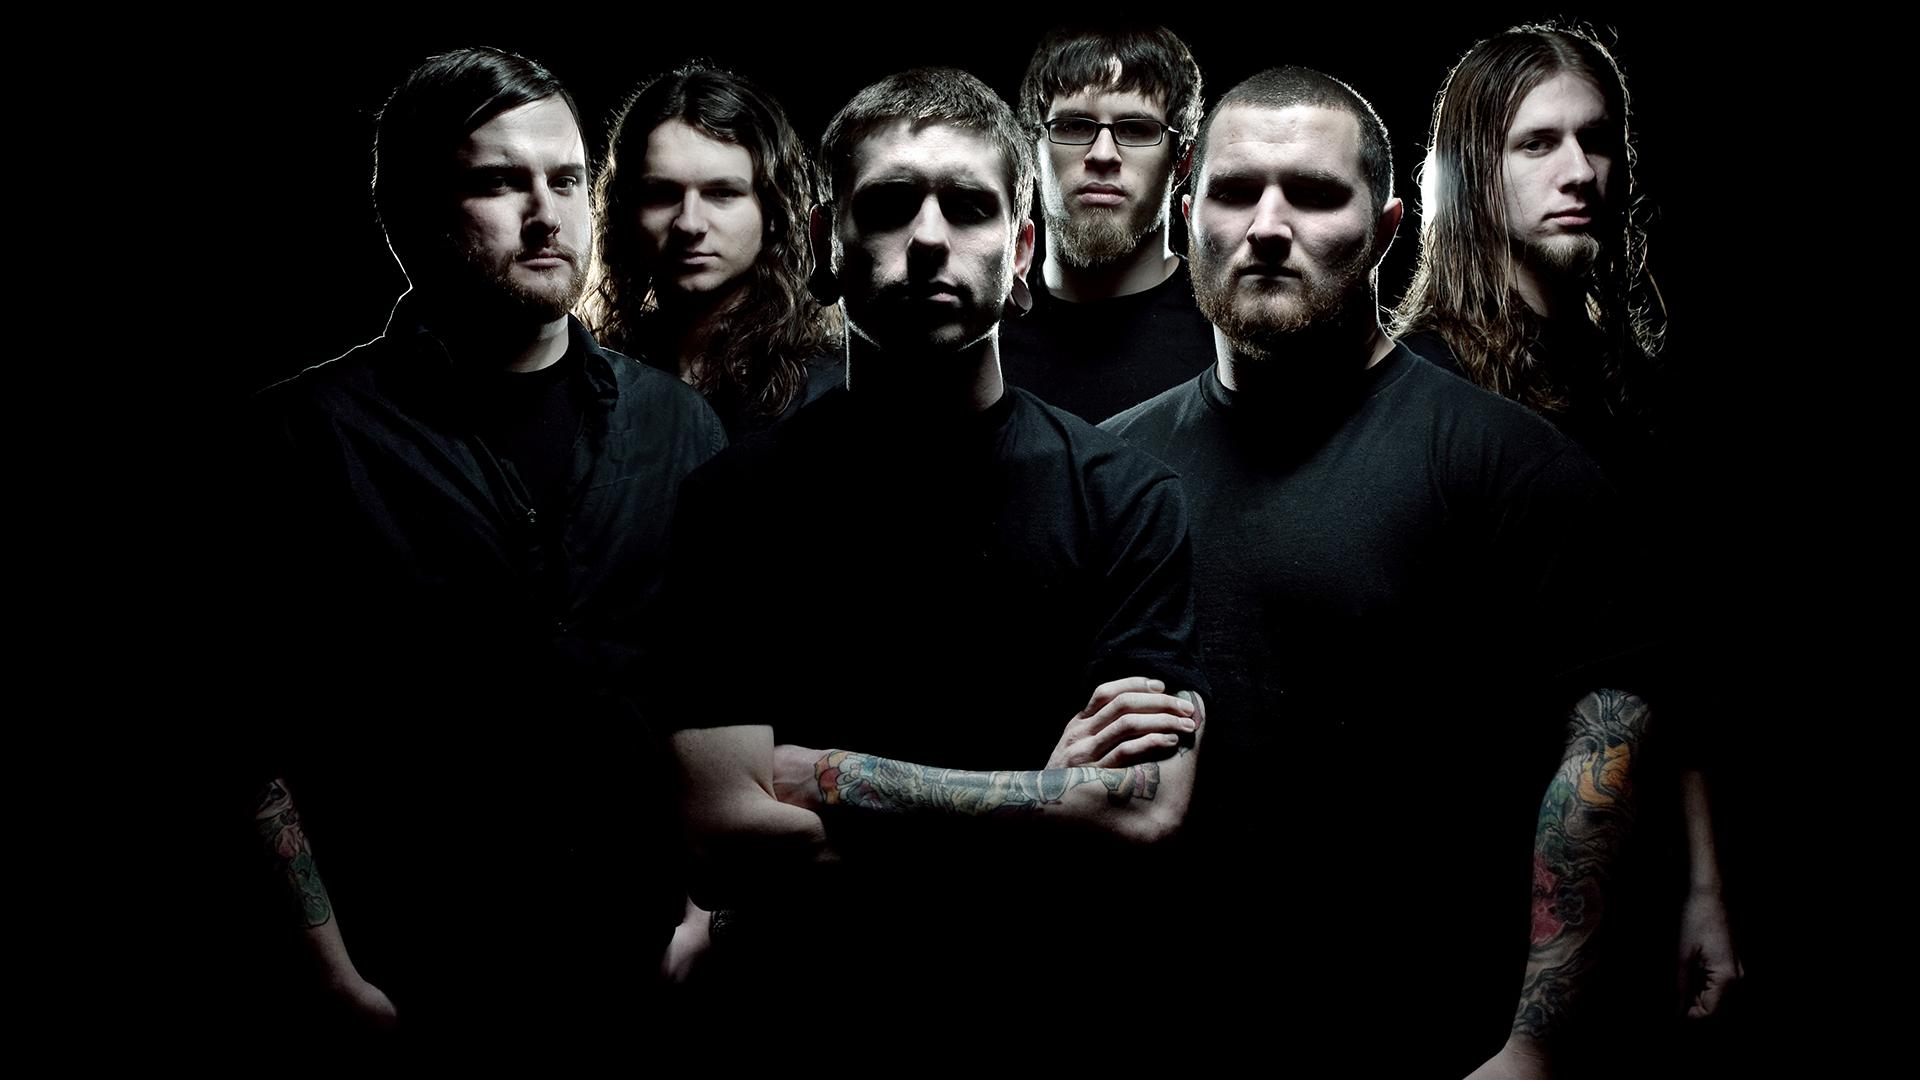 whitechapel deathcore heavy metal alternative metal